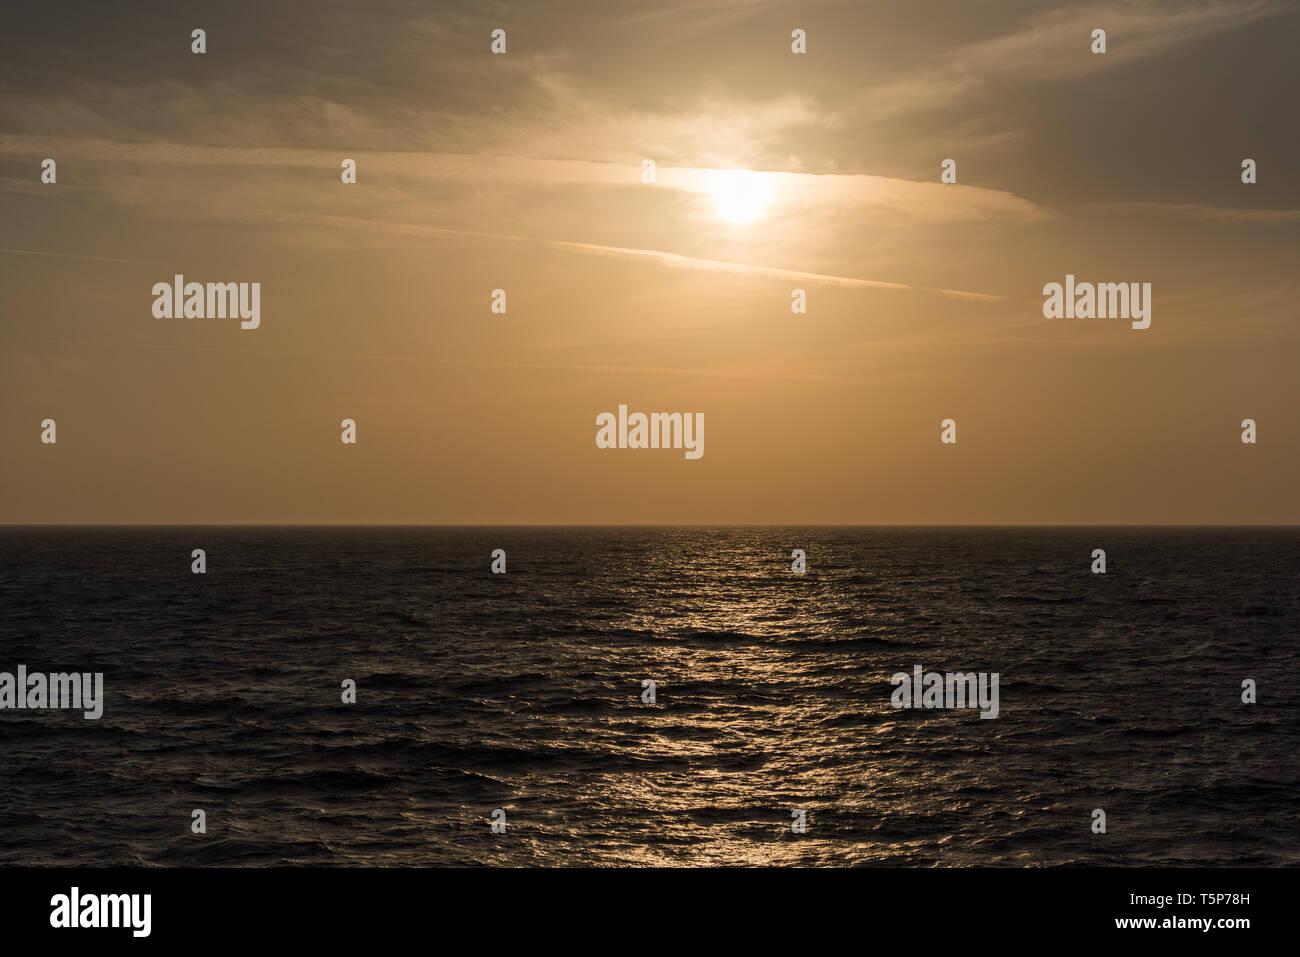 Orange sunset above sea from ship - Stock Image